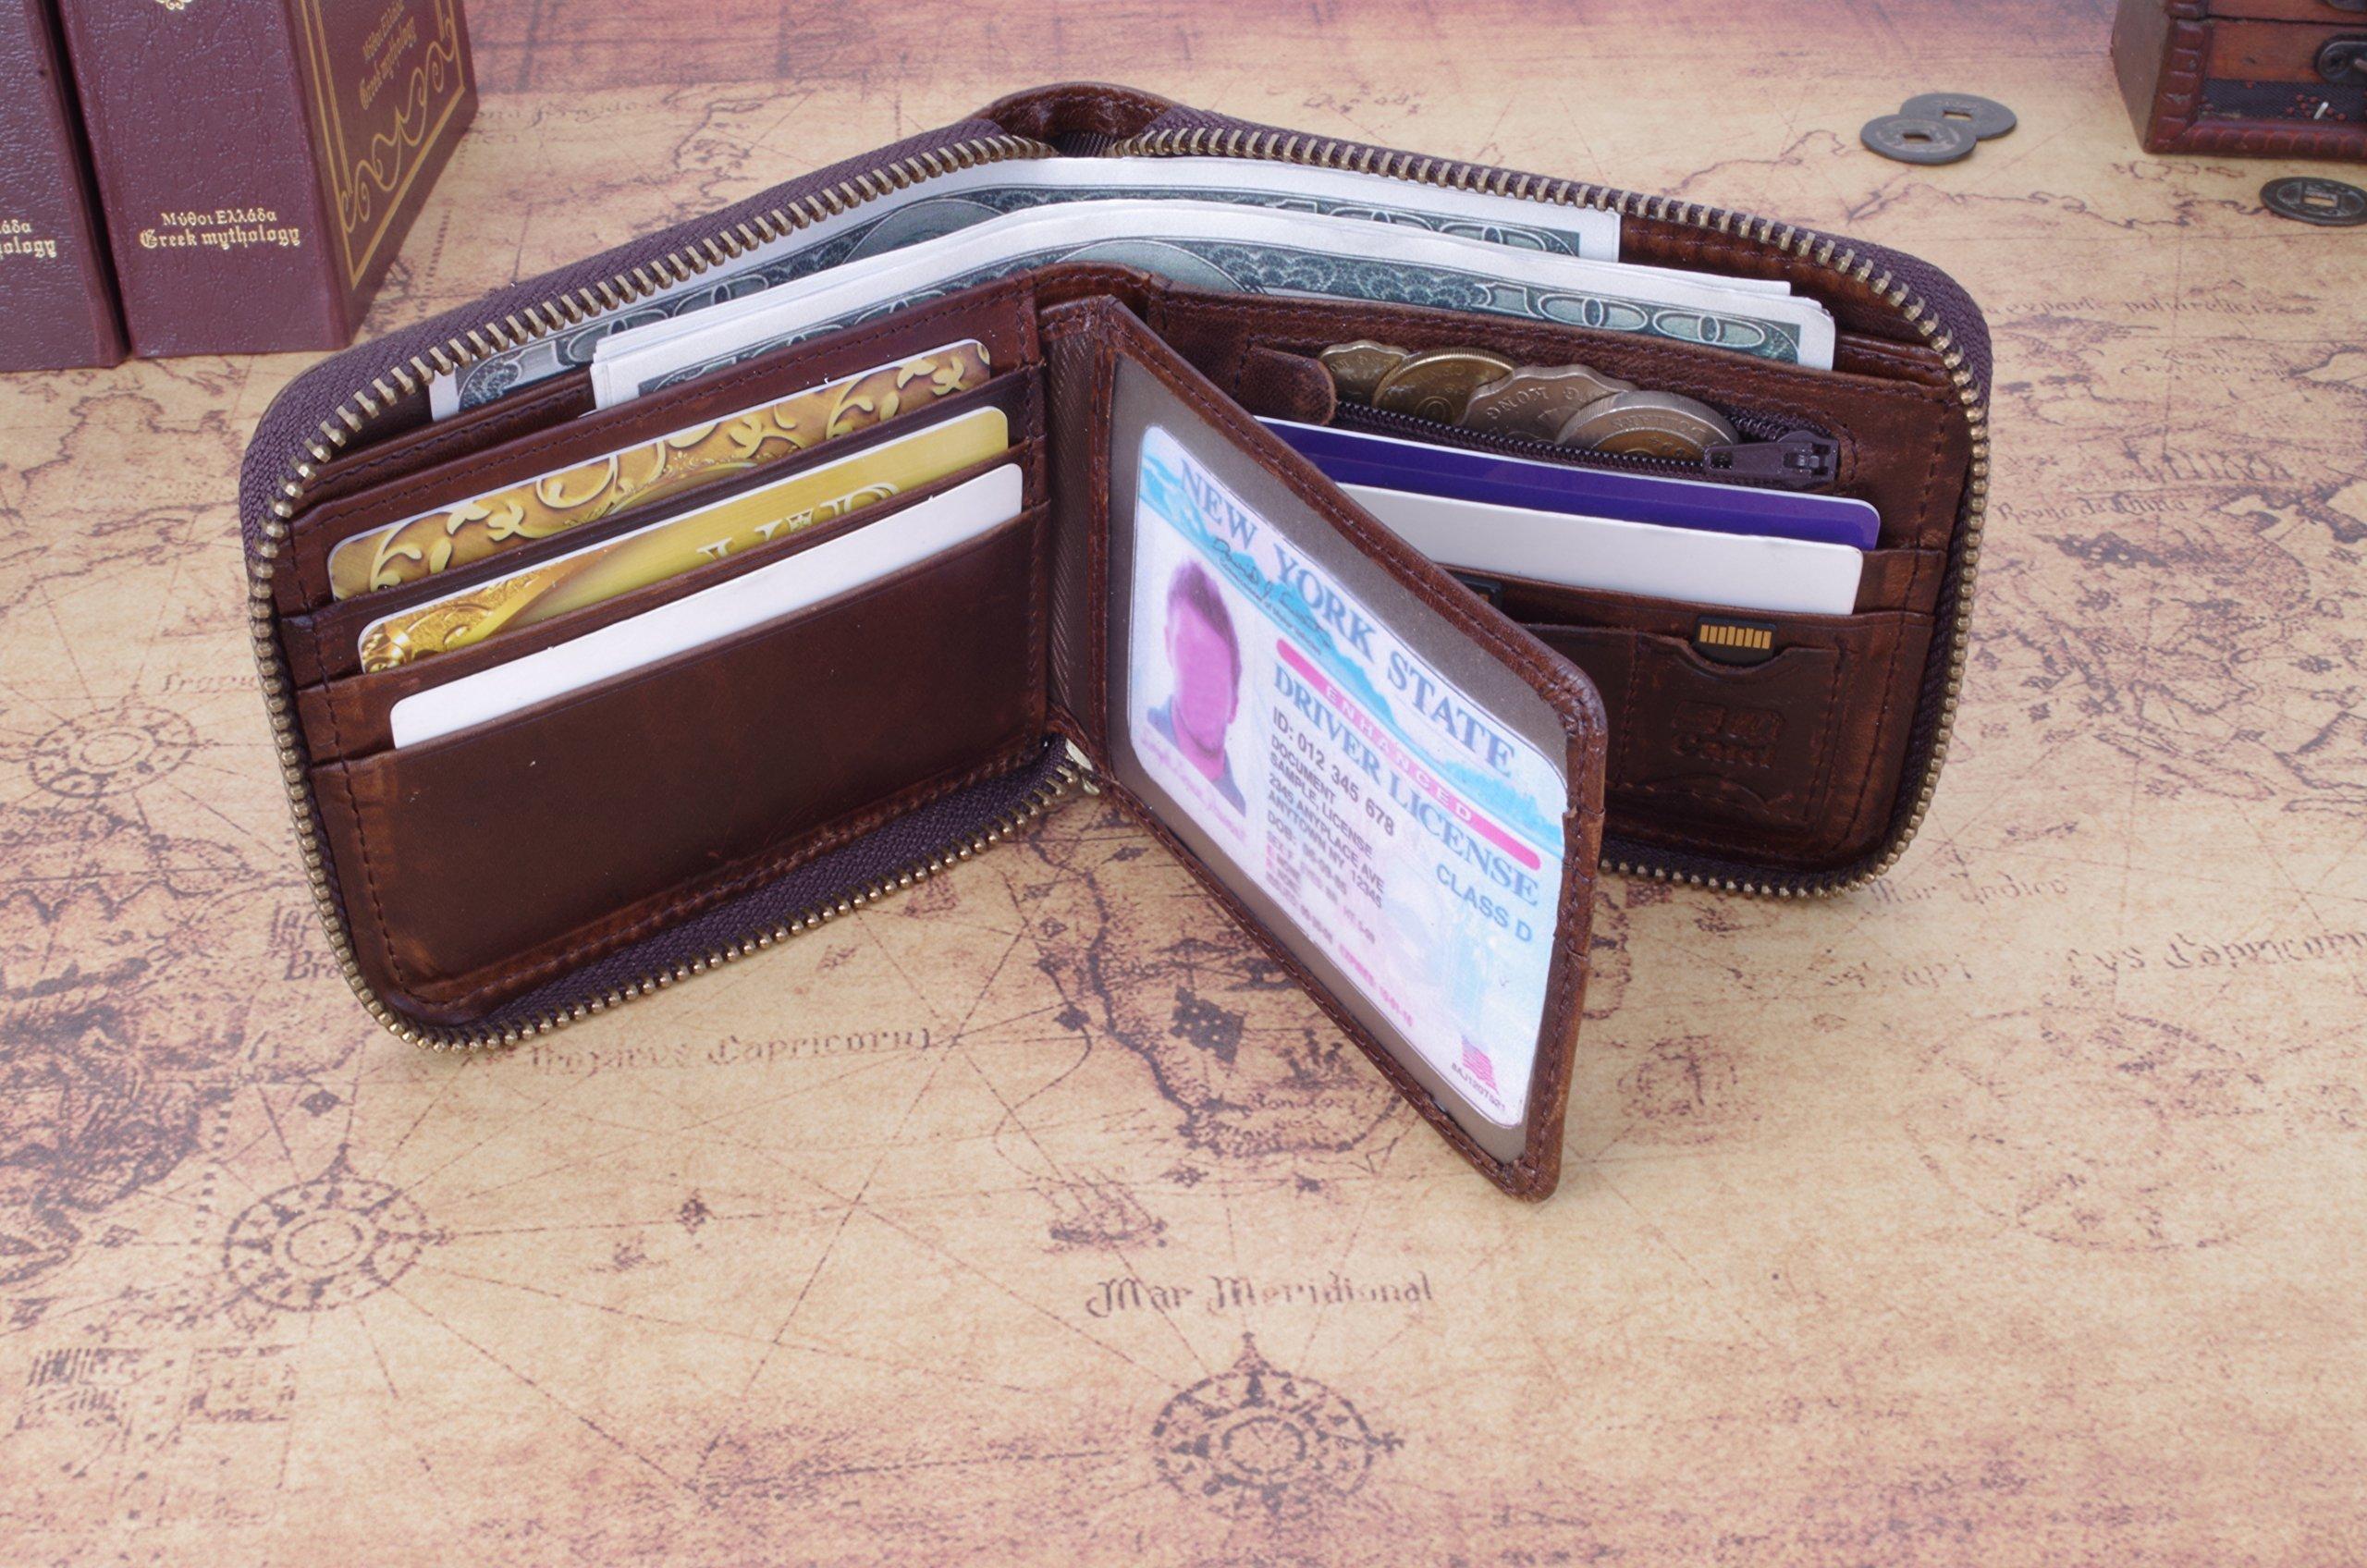 Admetus Men's Genuine Leather Short Zip-around Bifold Wallet (brown) by Admetus (Image #3)